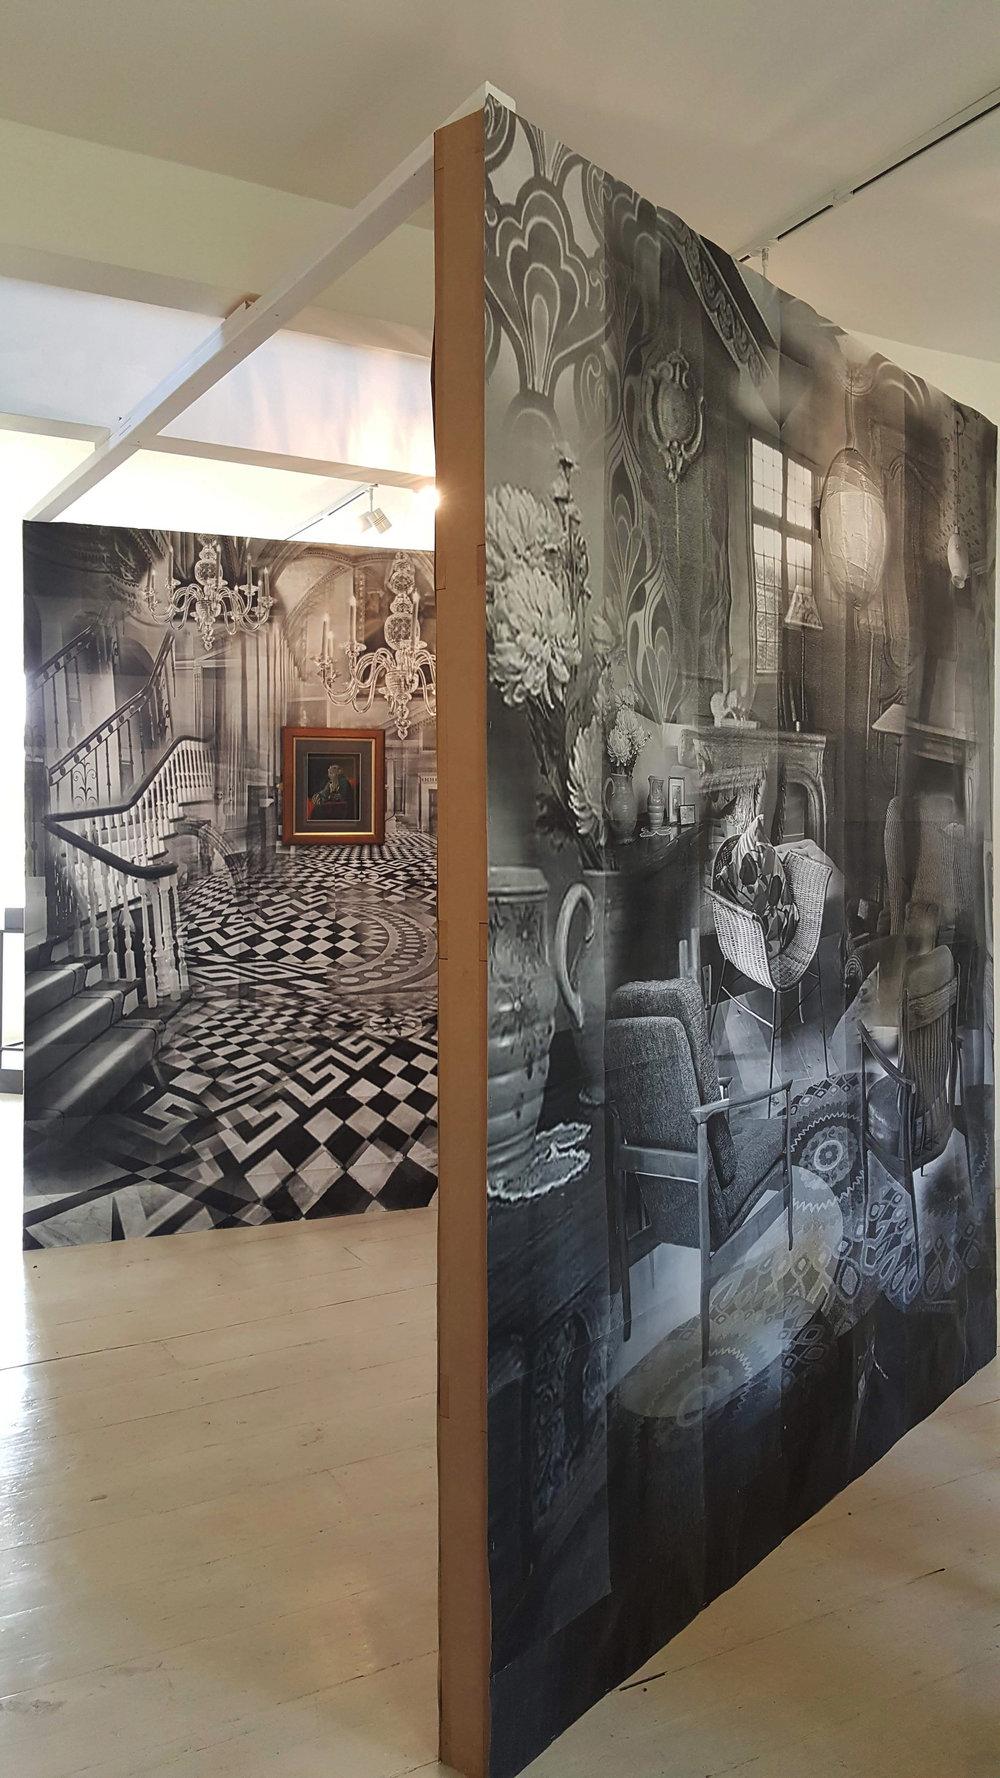 Sasha Bowles_Rooms backdrops_Arthouse1 Gallery.jpg